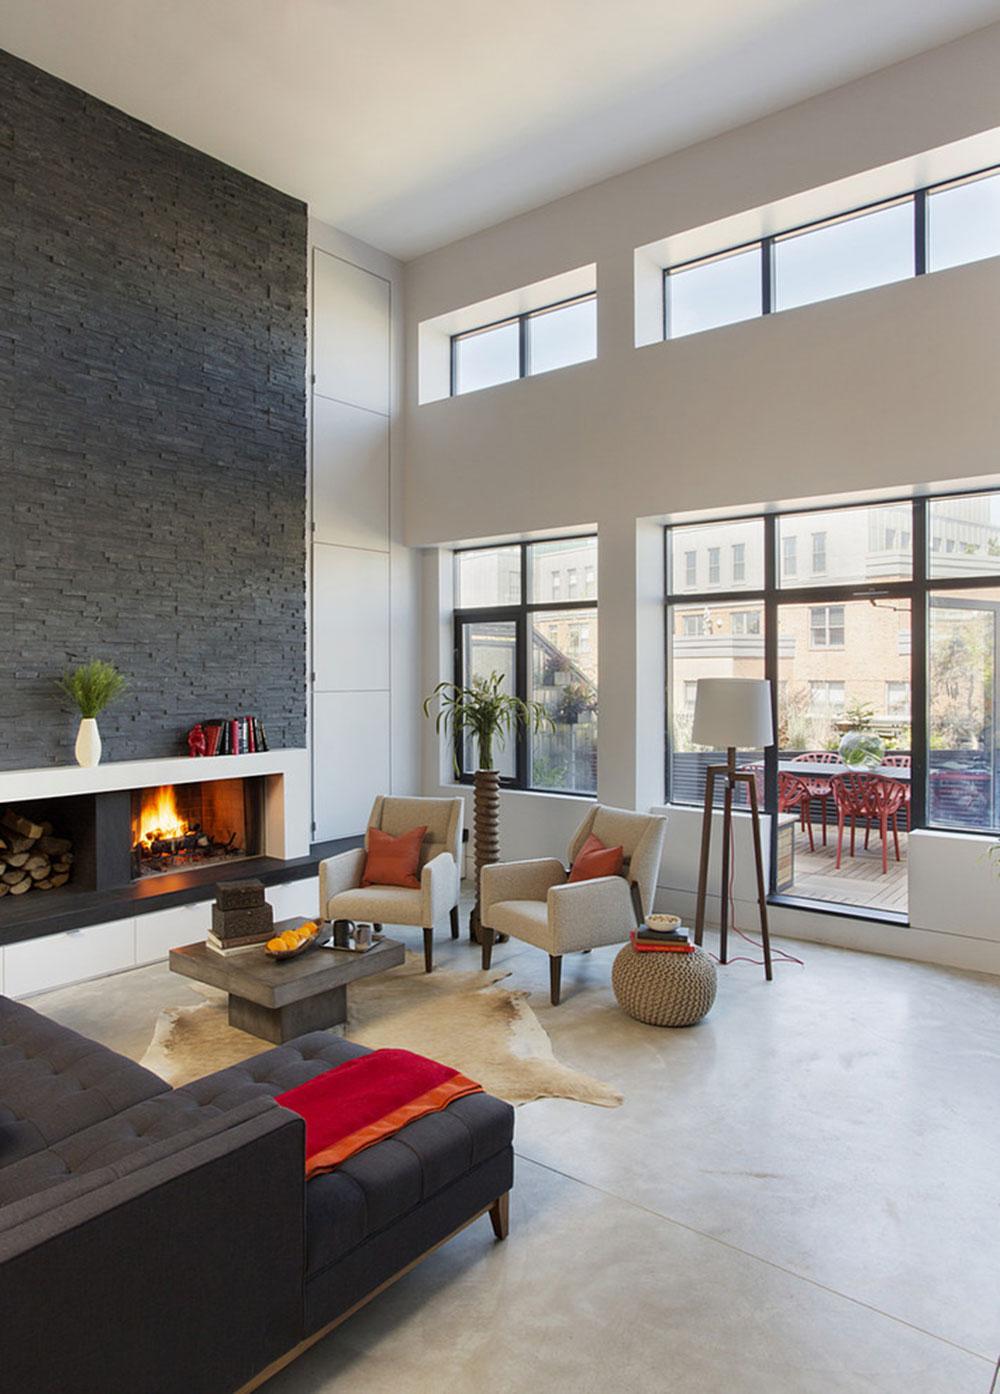 Improve Your Mood With Interior Design5 Improve Your Mood With Interior Design